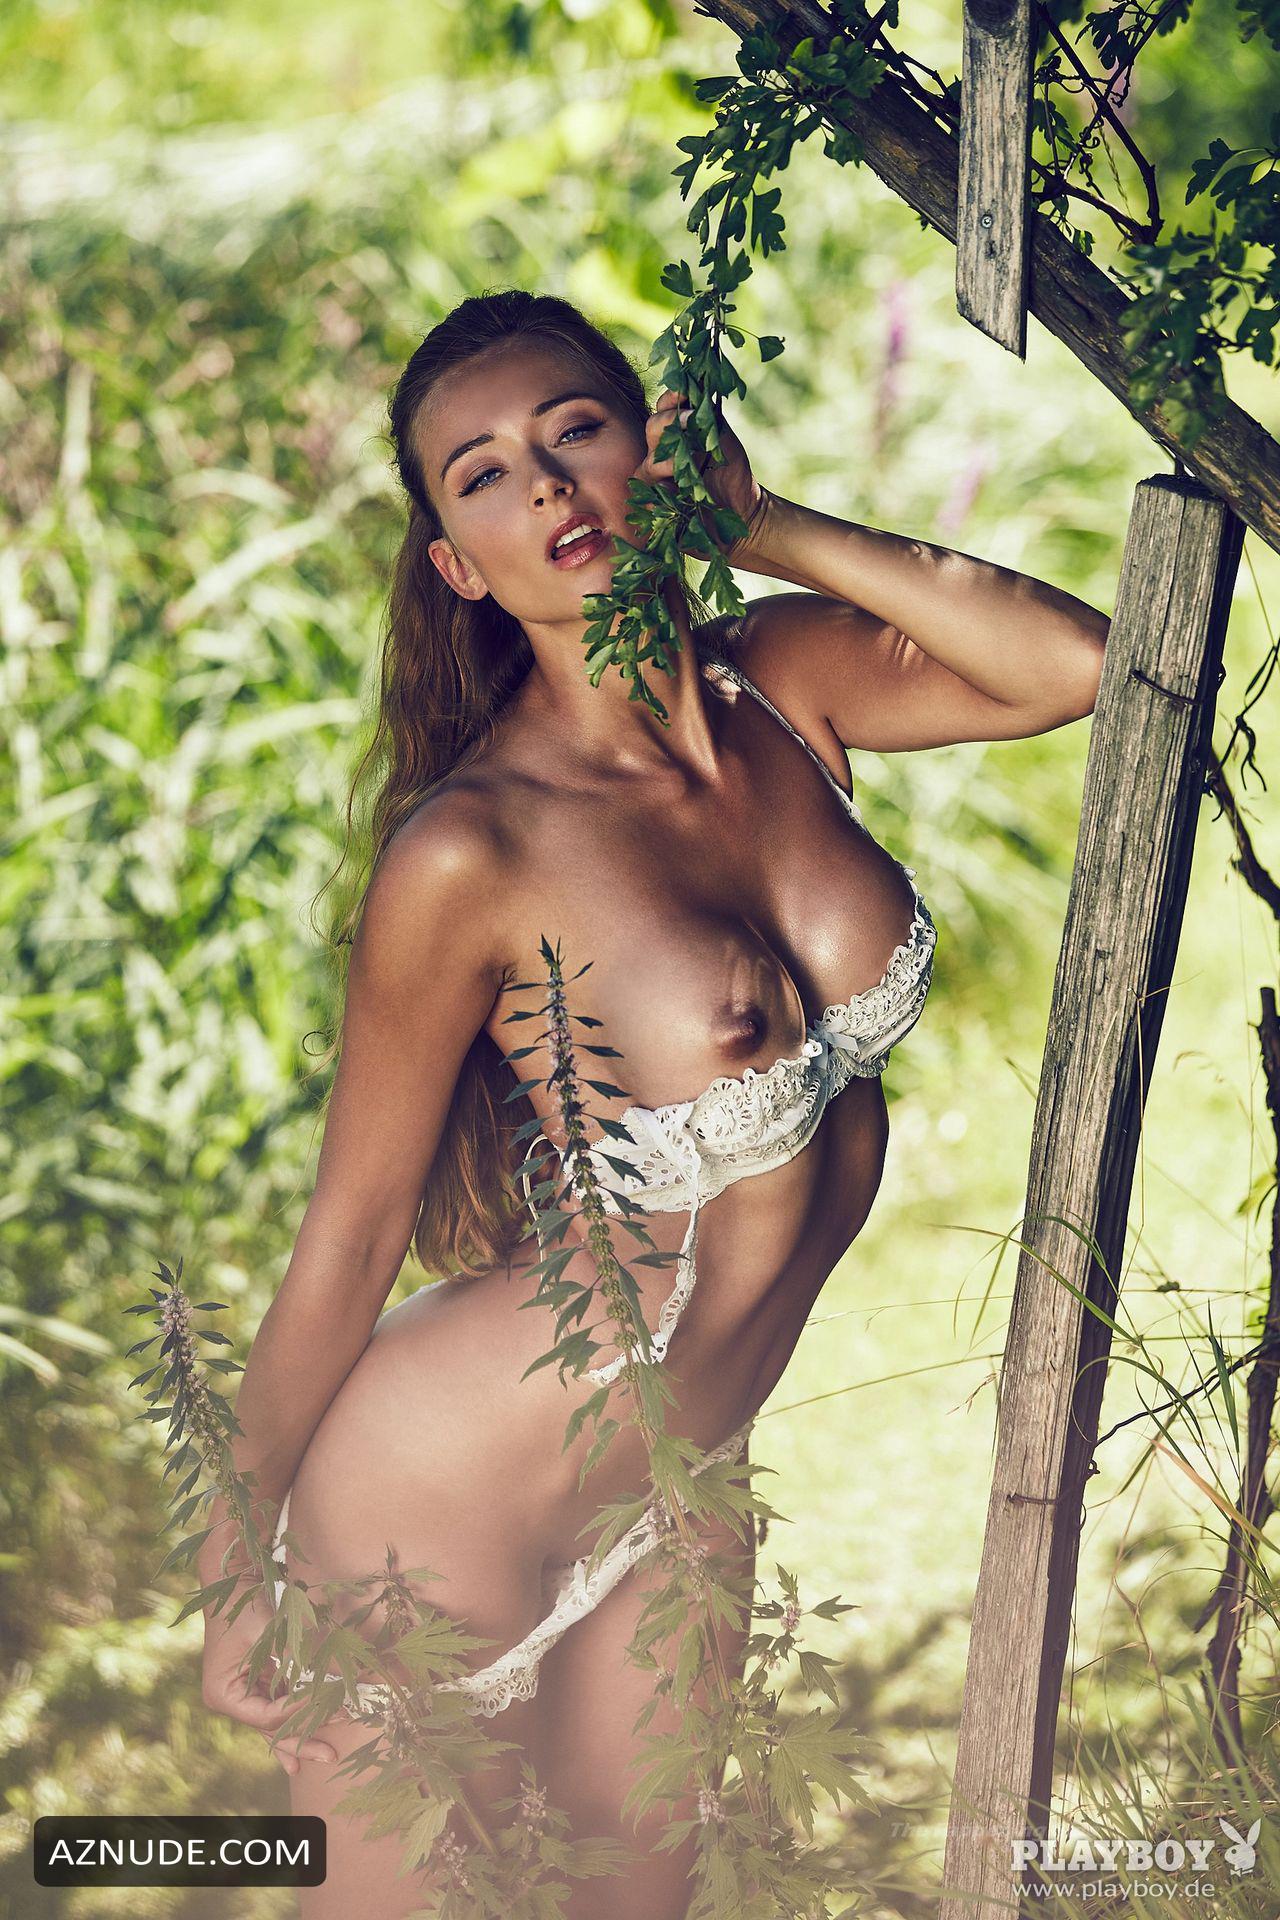 Kühne nude jessica Hot Leak